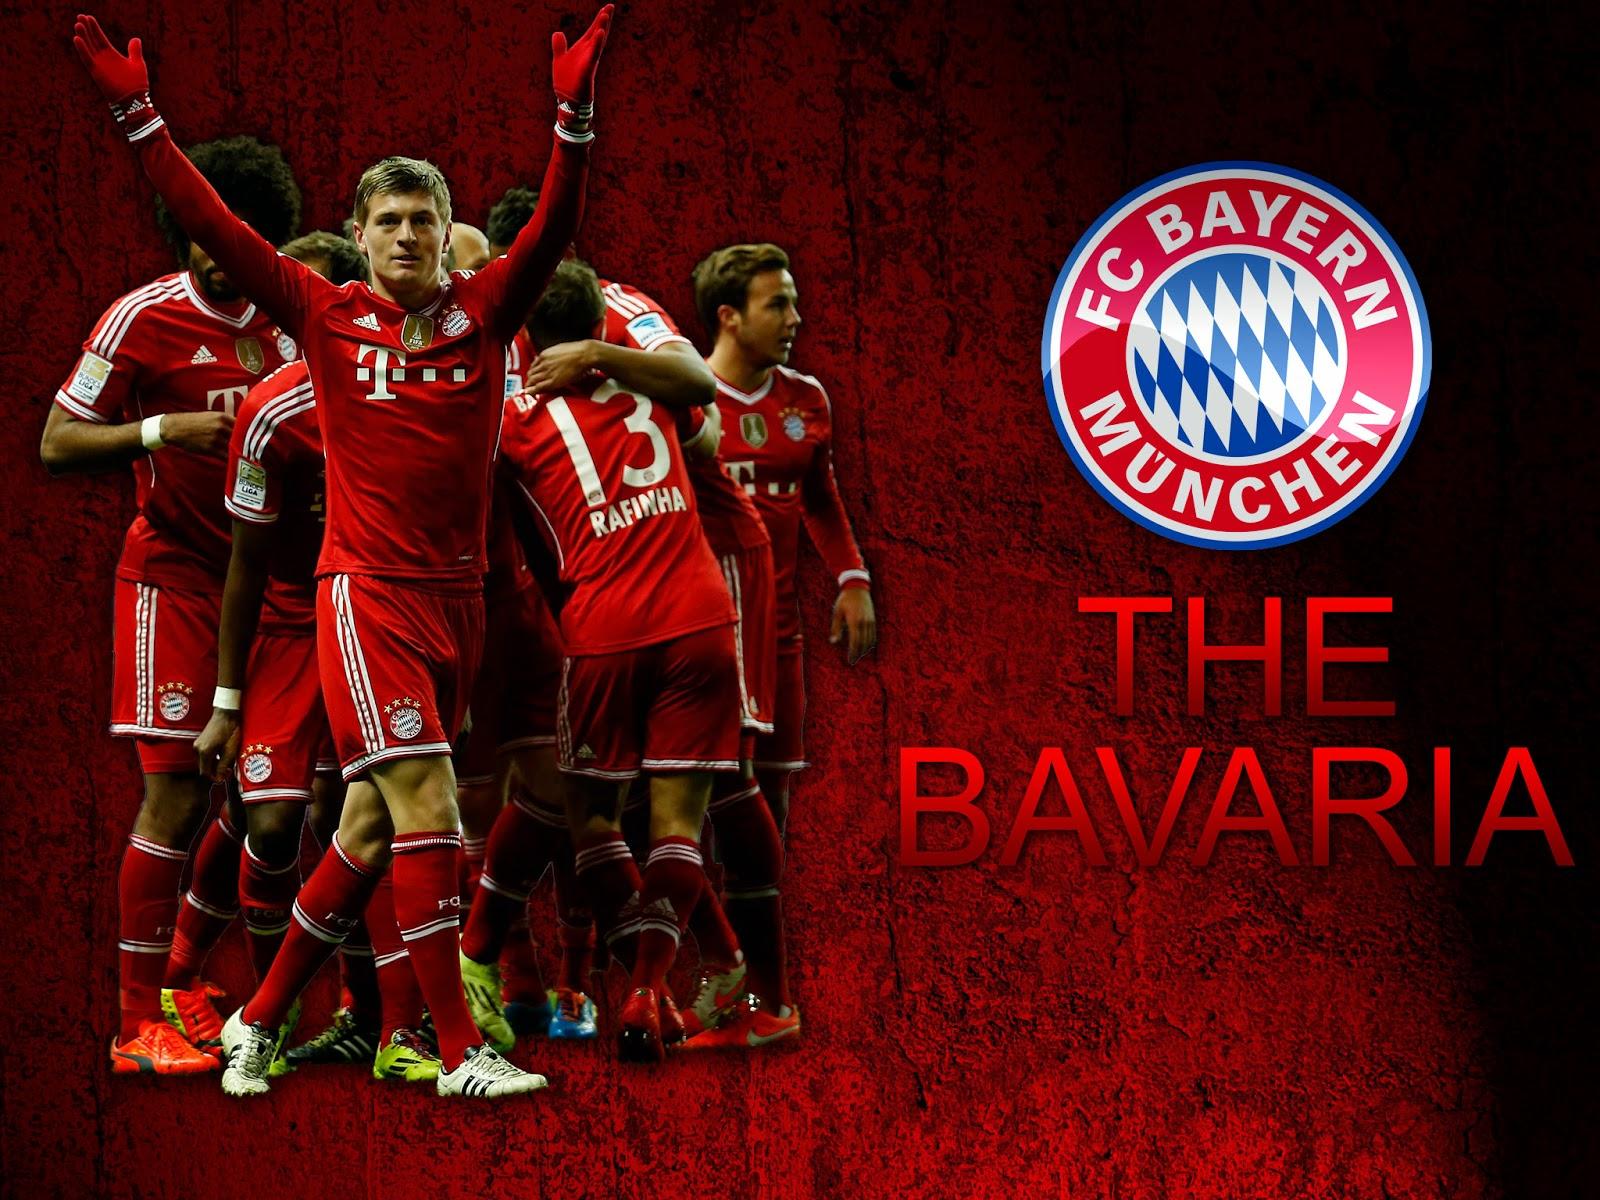 Wallpaper Bayern Munich In Germany HD For IPad